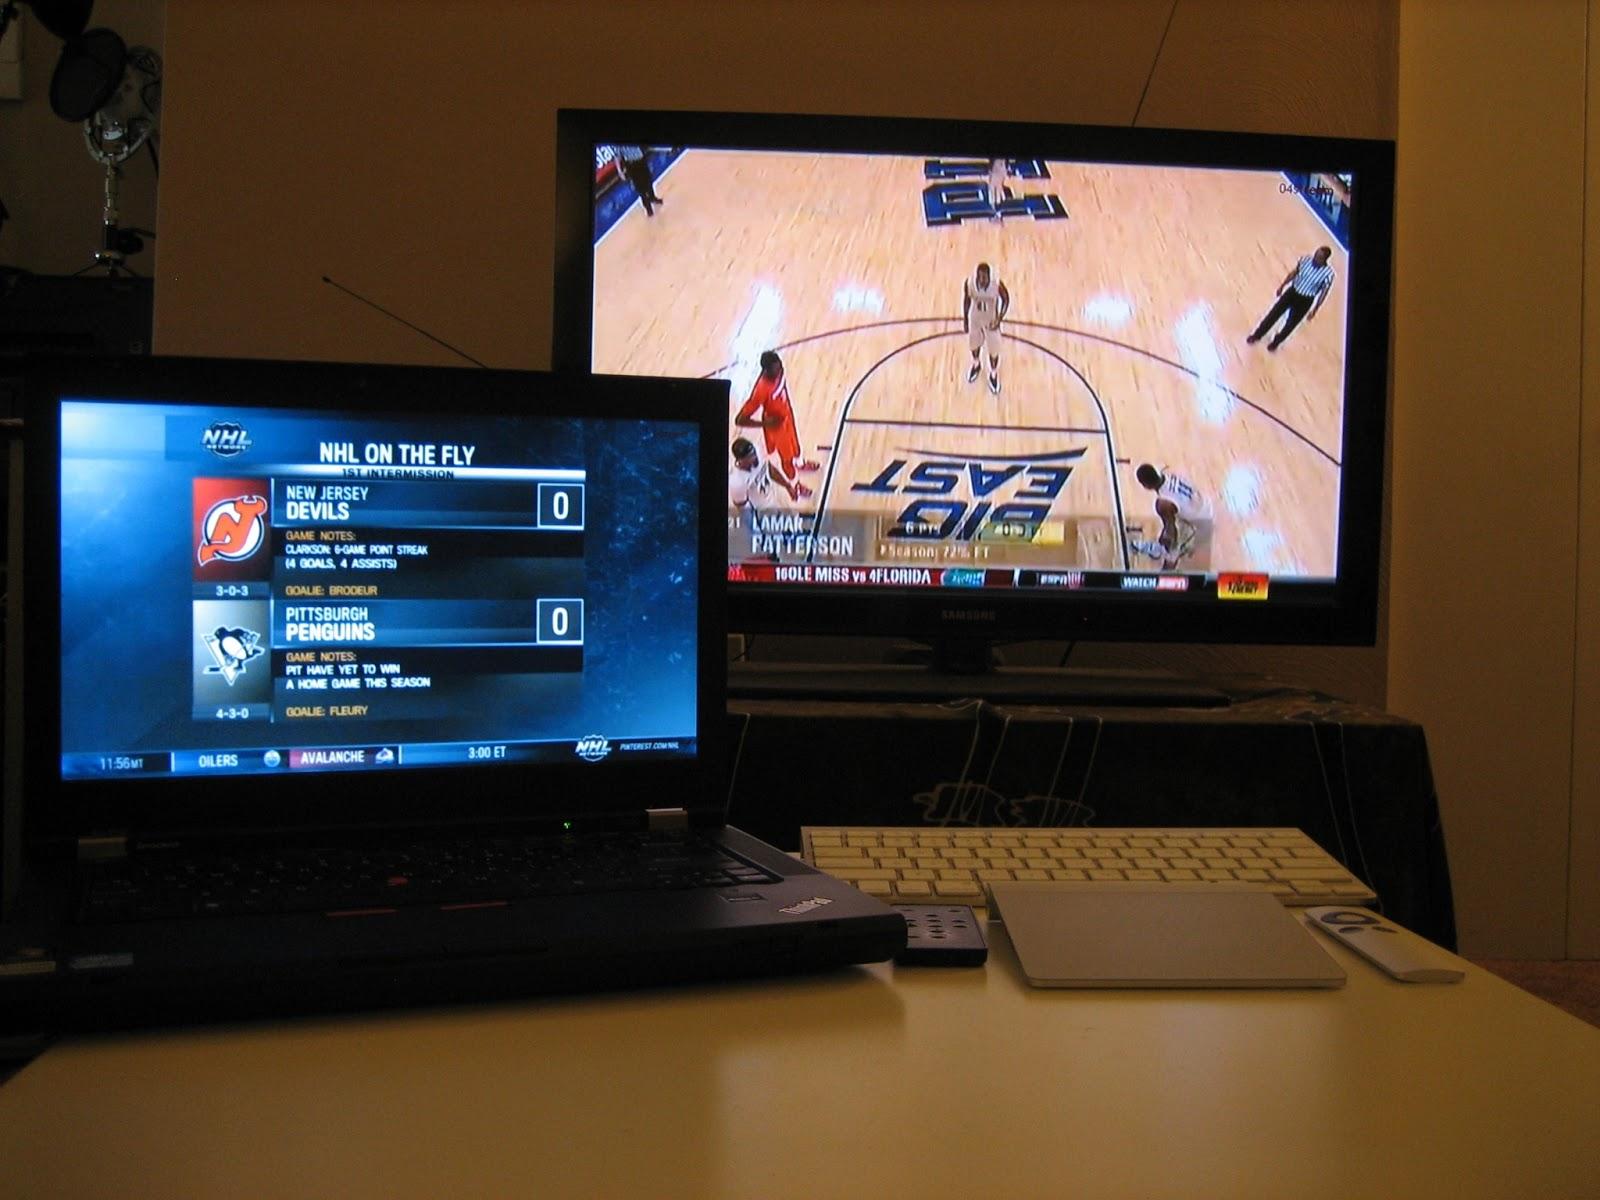 TSN Live Stream: How to Watch TSN Online Free